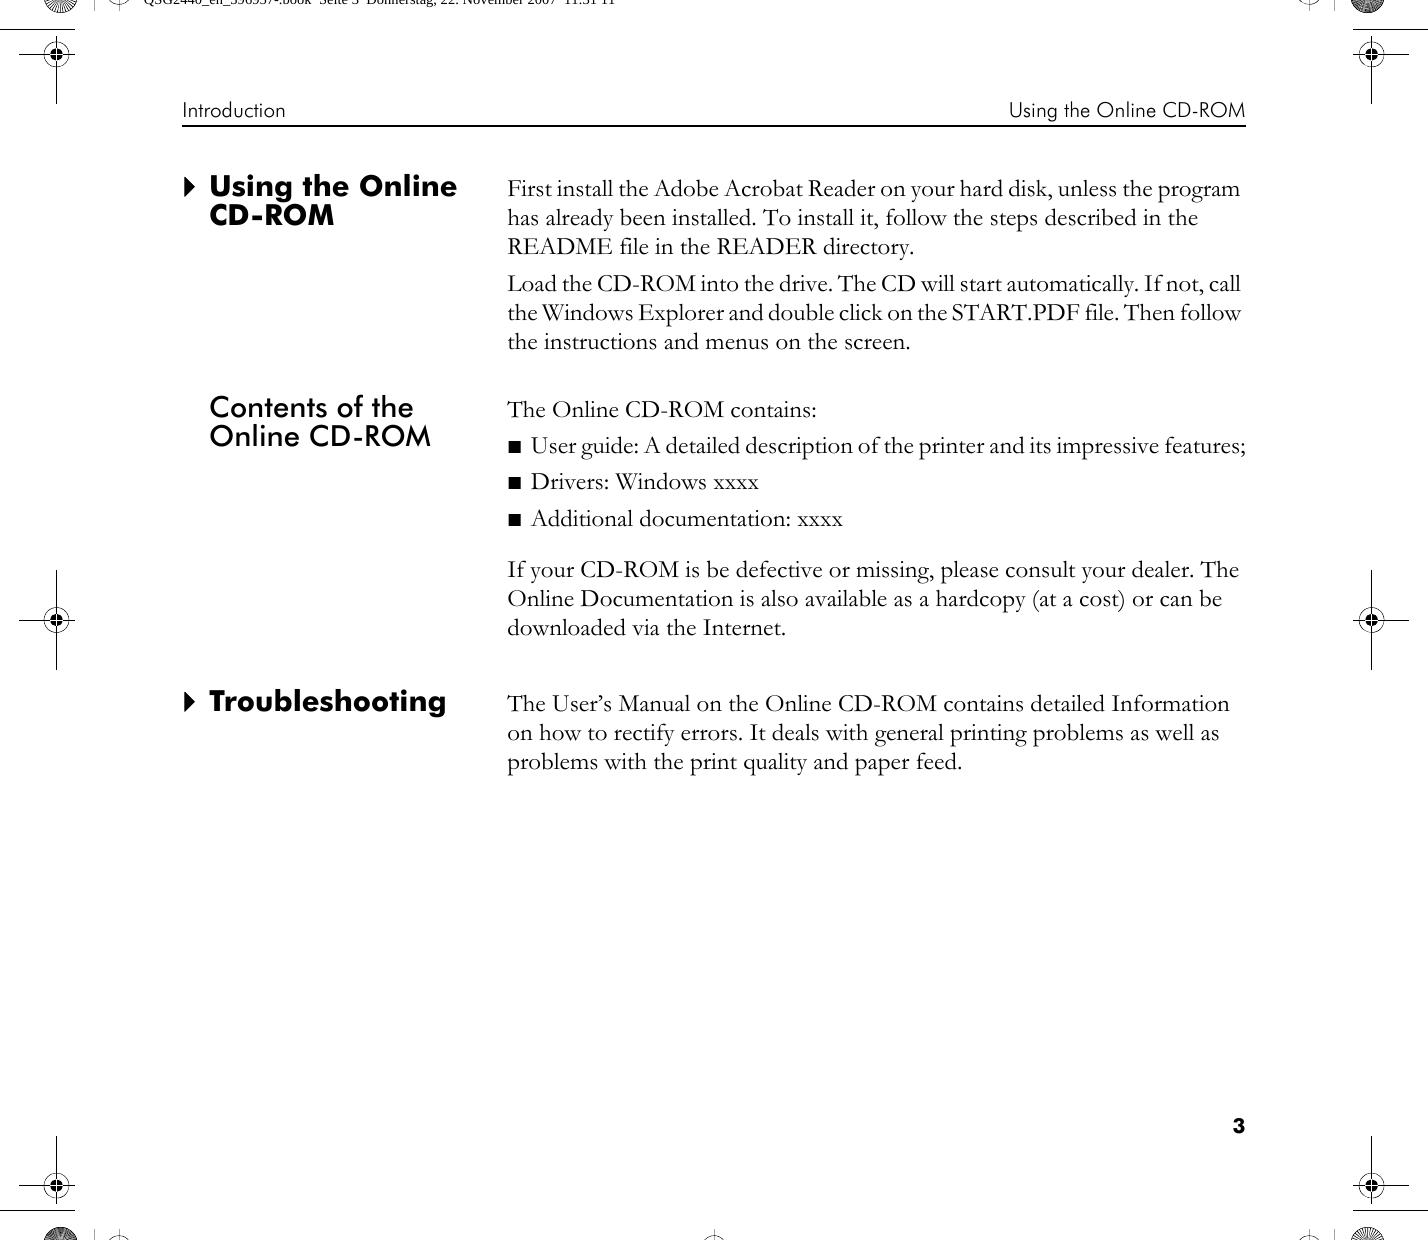 Printer troubleshooting guide pdf choice image free windows 7 troubleshooting guide choice image free windows 7 troubleshooting guide image collections free printer troubleshooting sciox Image collections